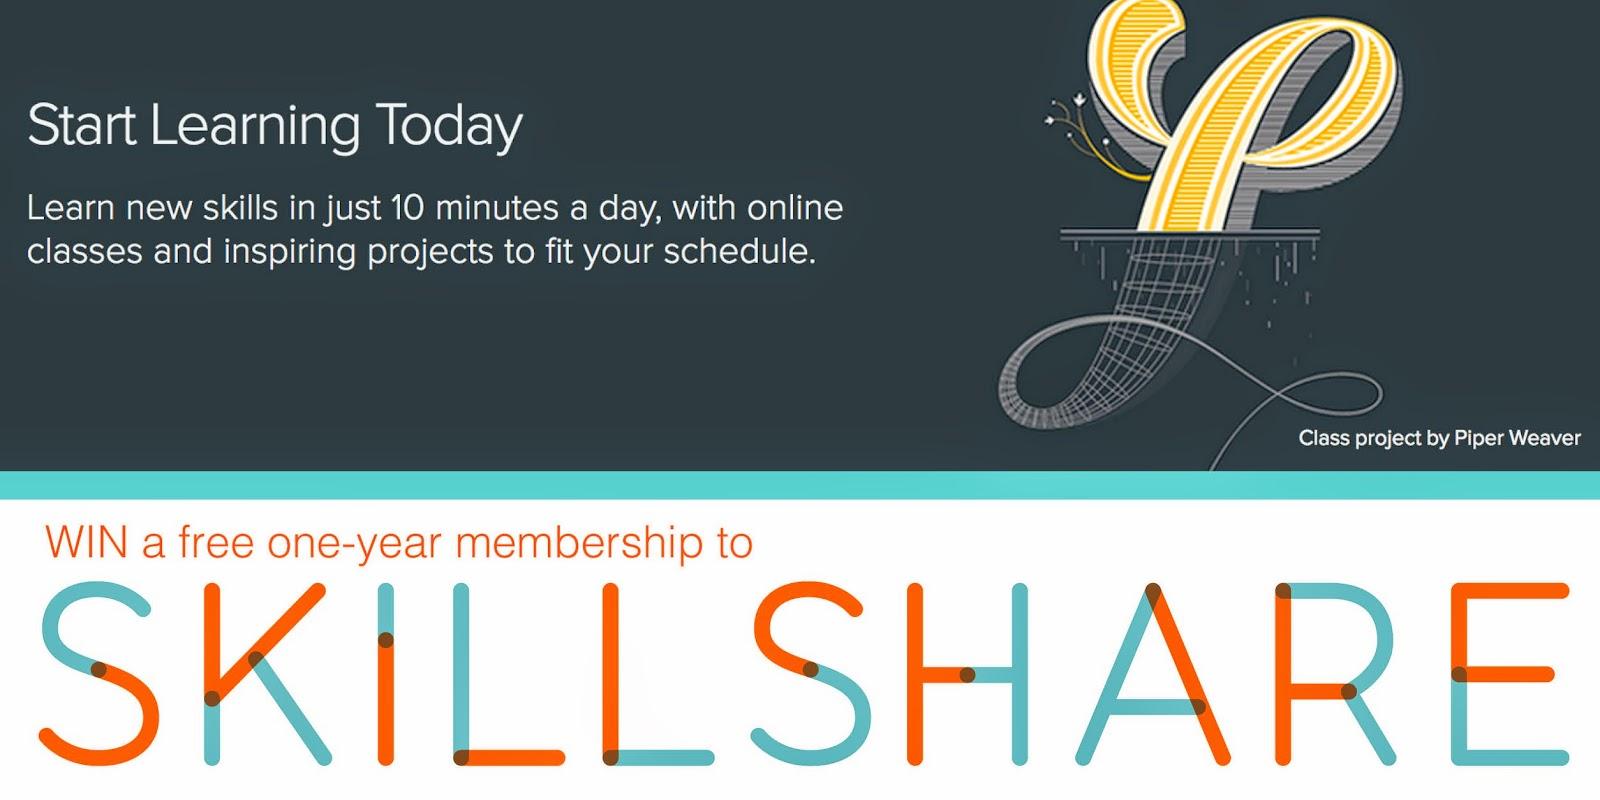 Skillshare   Slatecube by Microbold